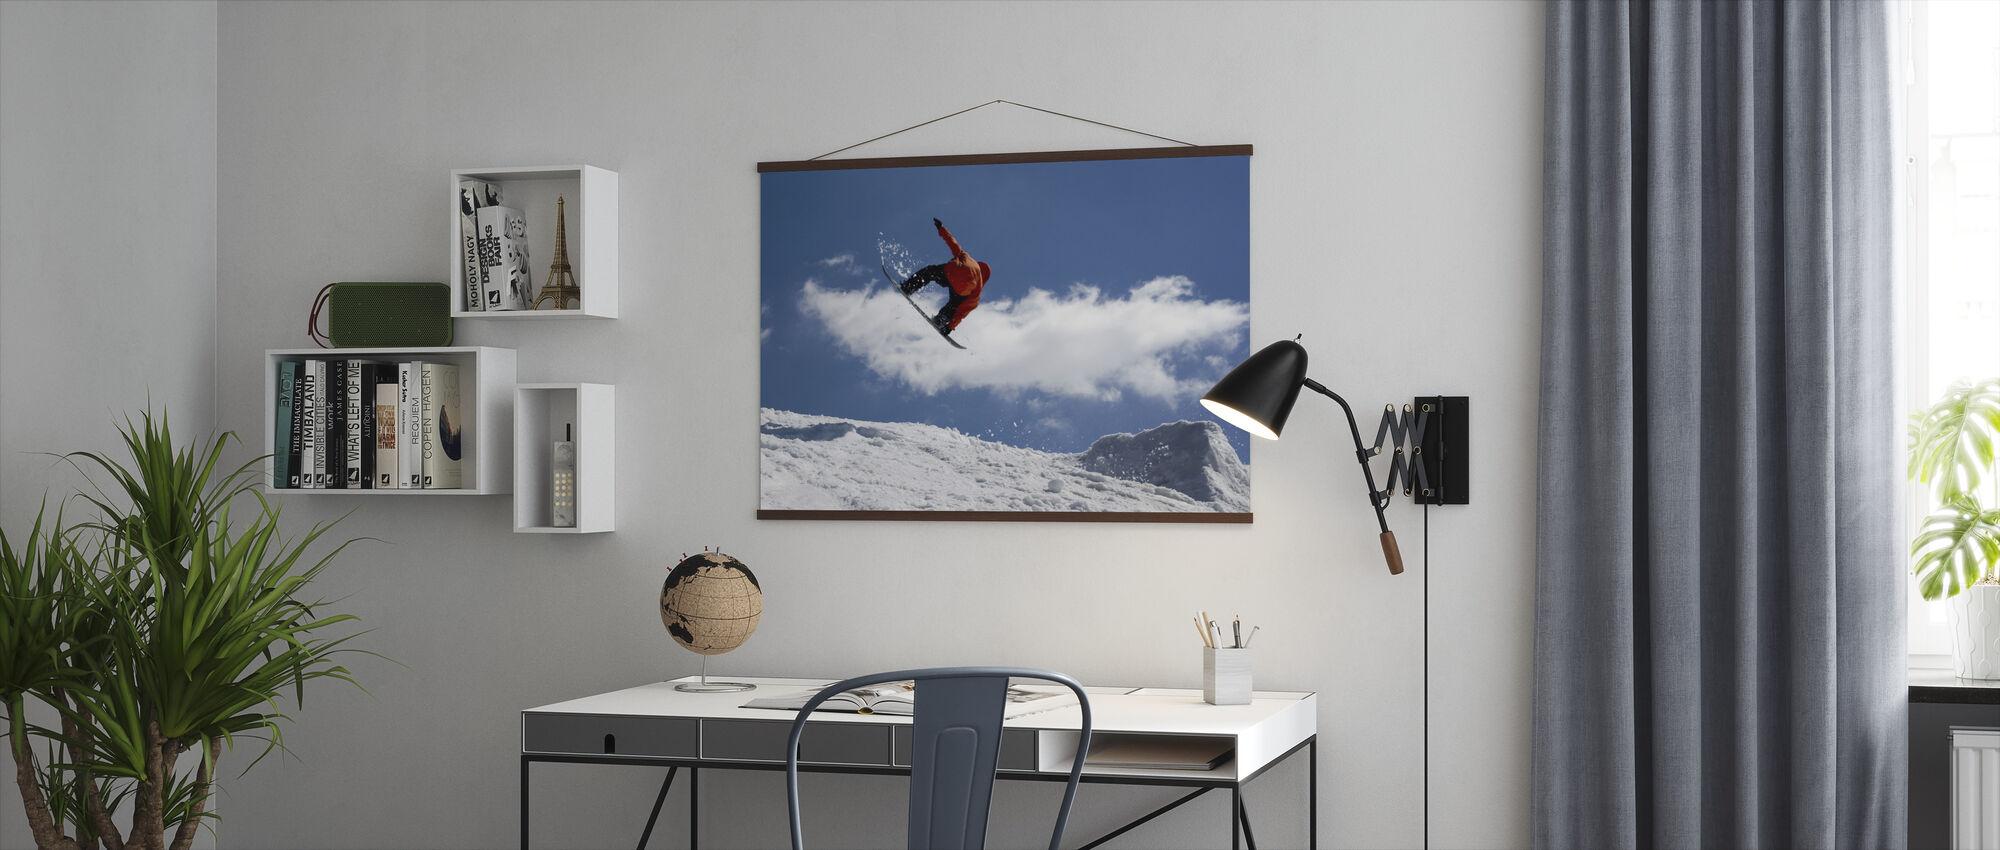 Snowboard Jump van Ramp - Poster - Kantoor